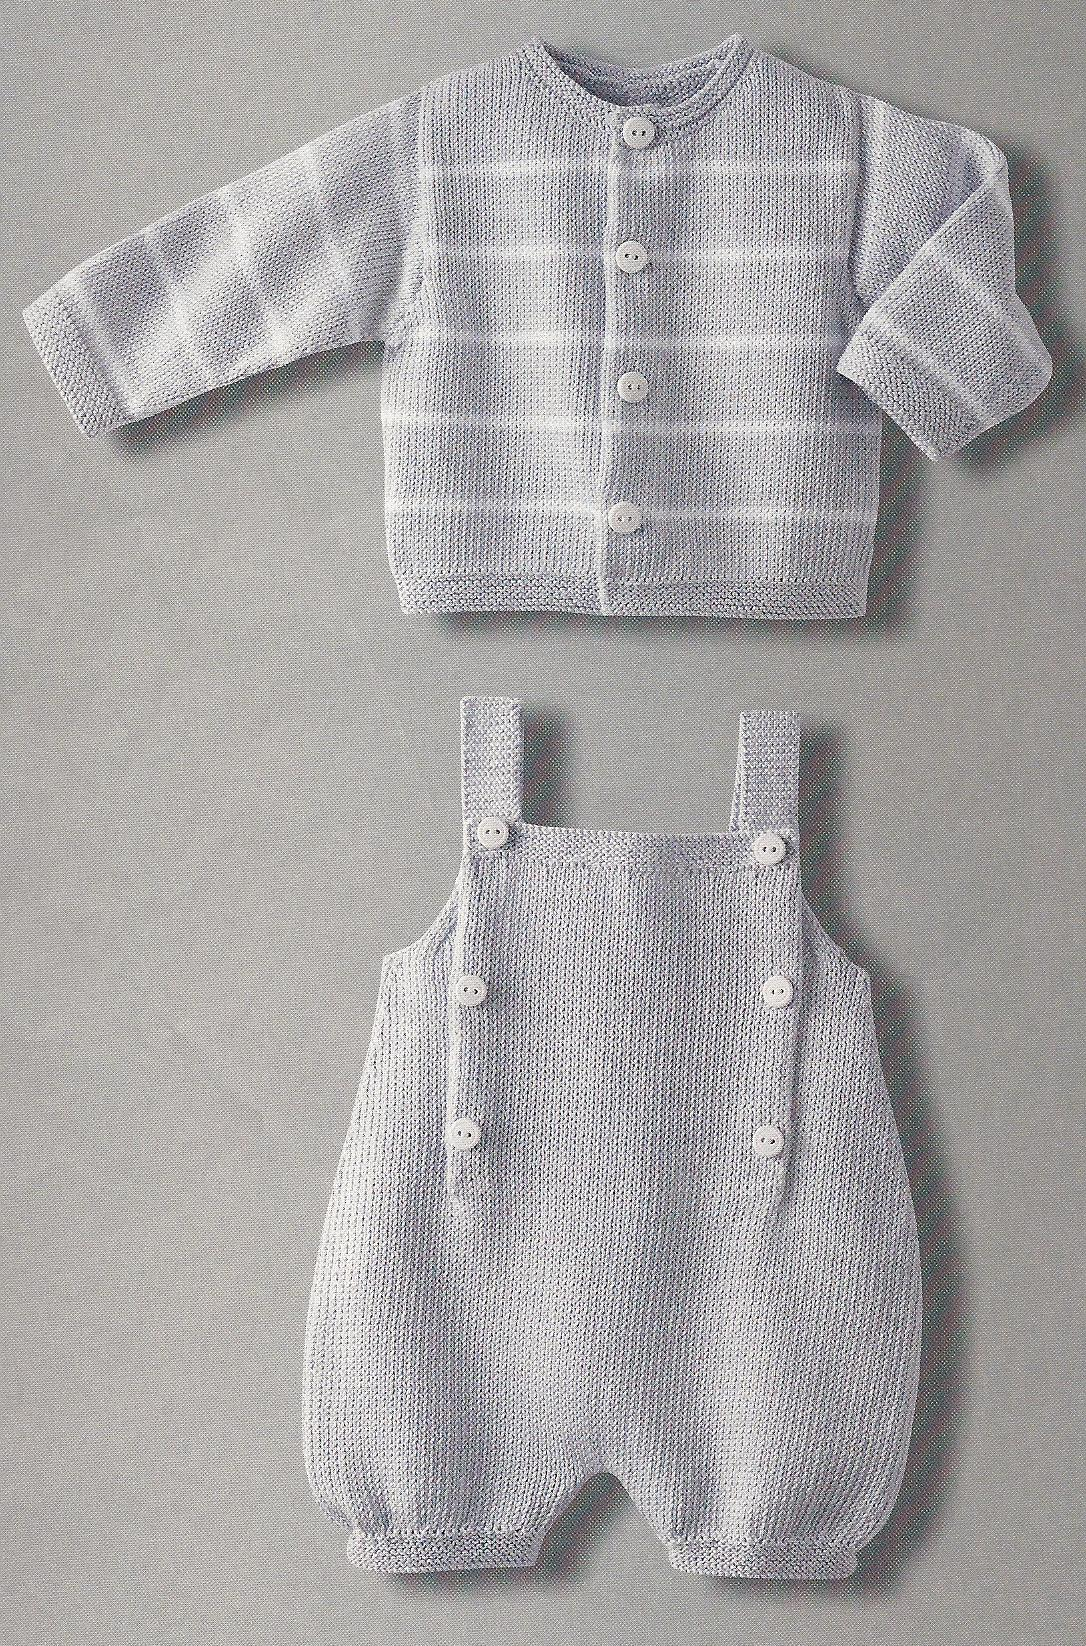 Pinterest Knitting Patterns Free Baby : LEGGINGS-PANTALONCINI. La Maglia di Marica Pagina 2